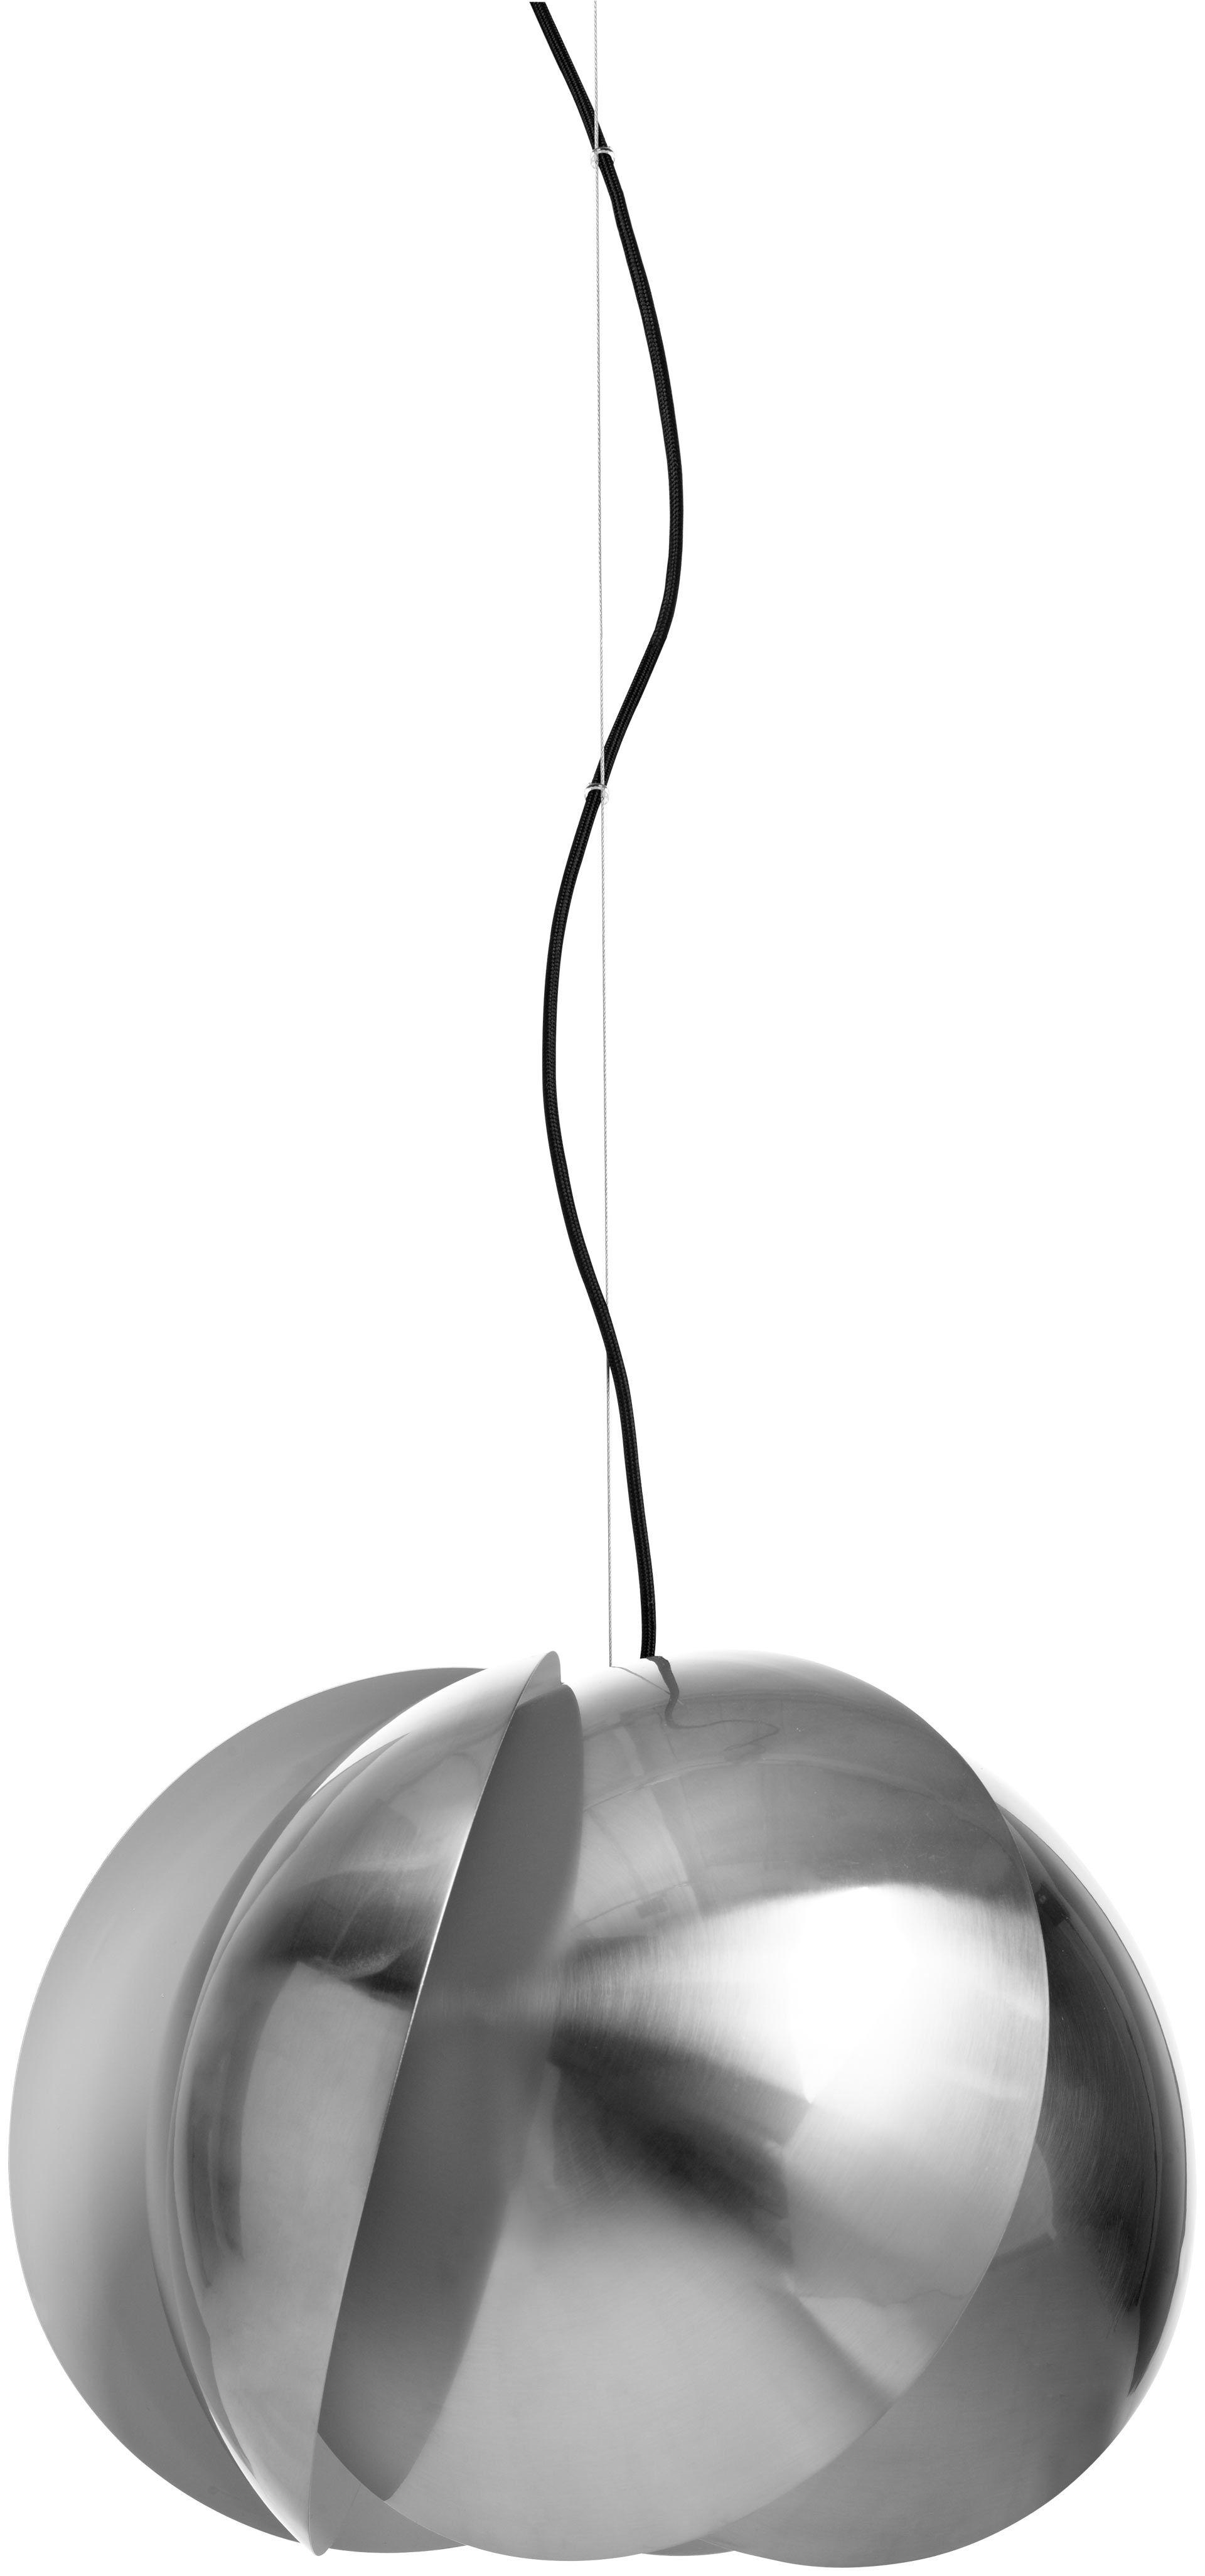 Moderna taklampor   Kvalitet från BoConcept   Pendelleuchten design, Boconcept, Lampe